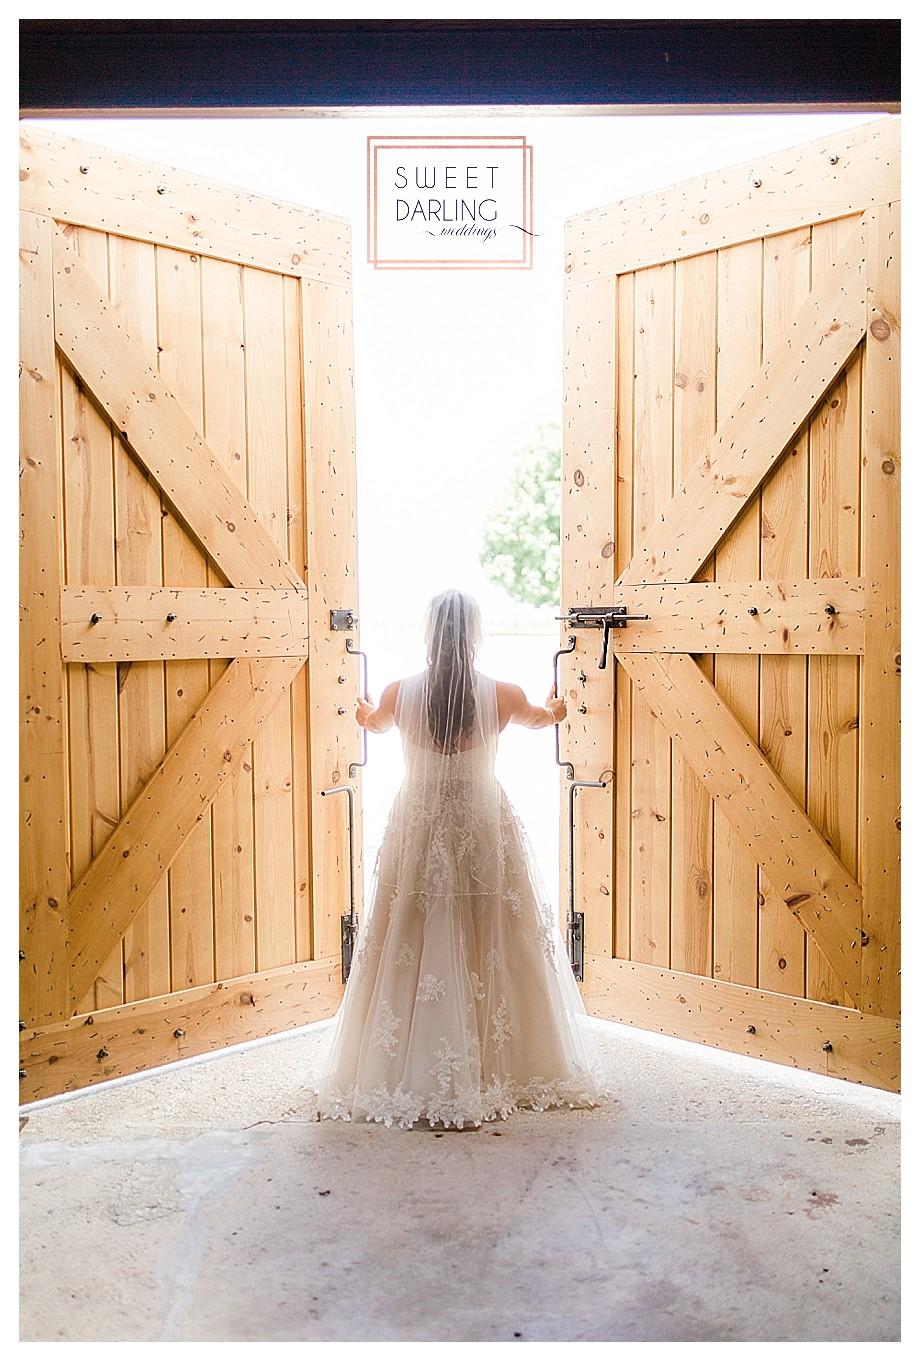 wedding-barn-farm-horses-sparkler-exit-Engelbrecht-Farm-Paxton-Illinois-Sweet-Darling-Weddings-Photographer_0461